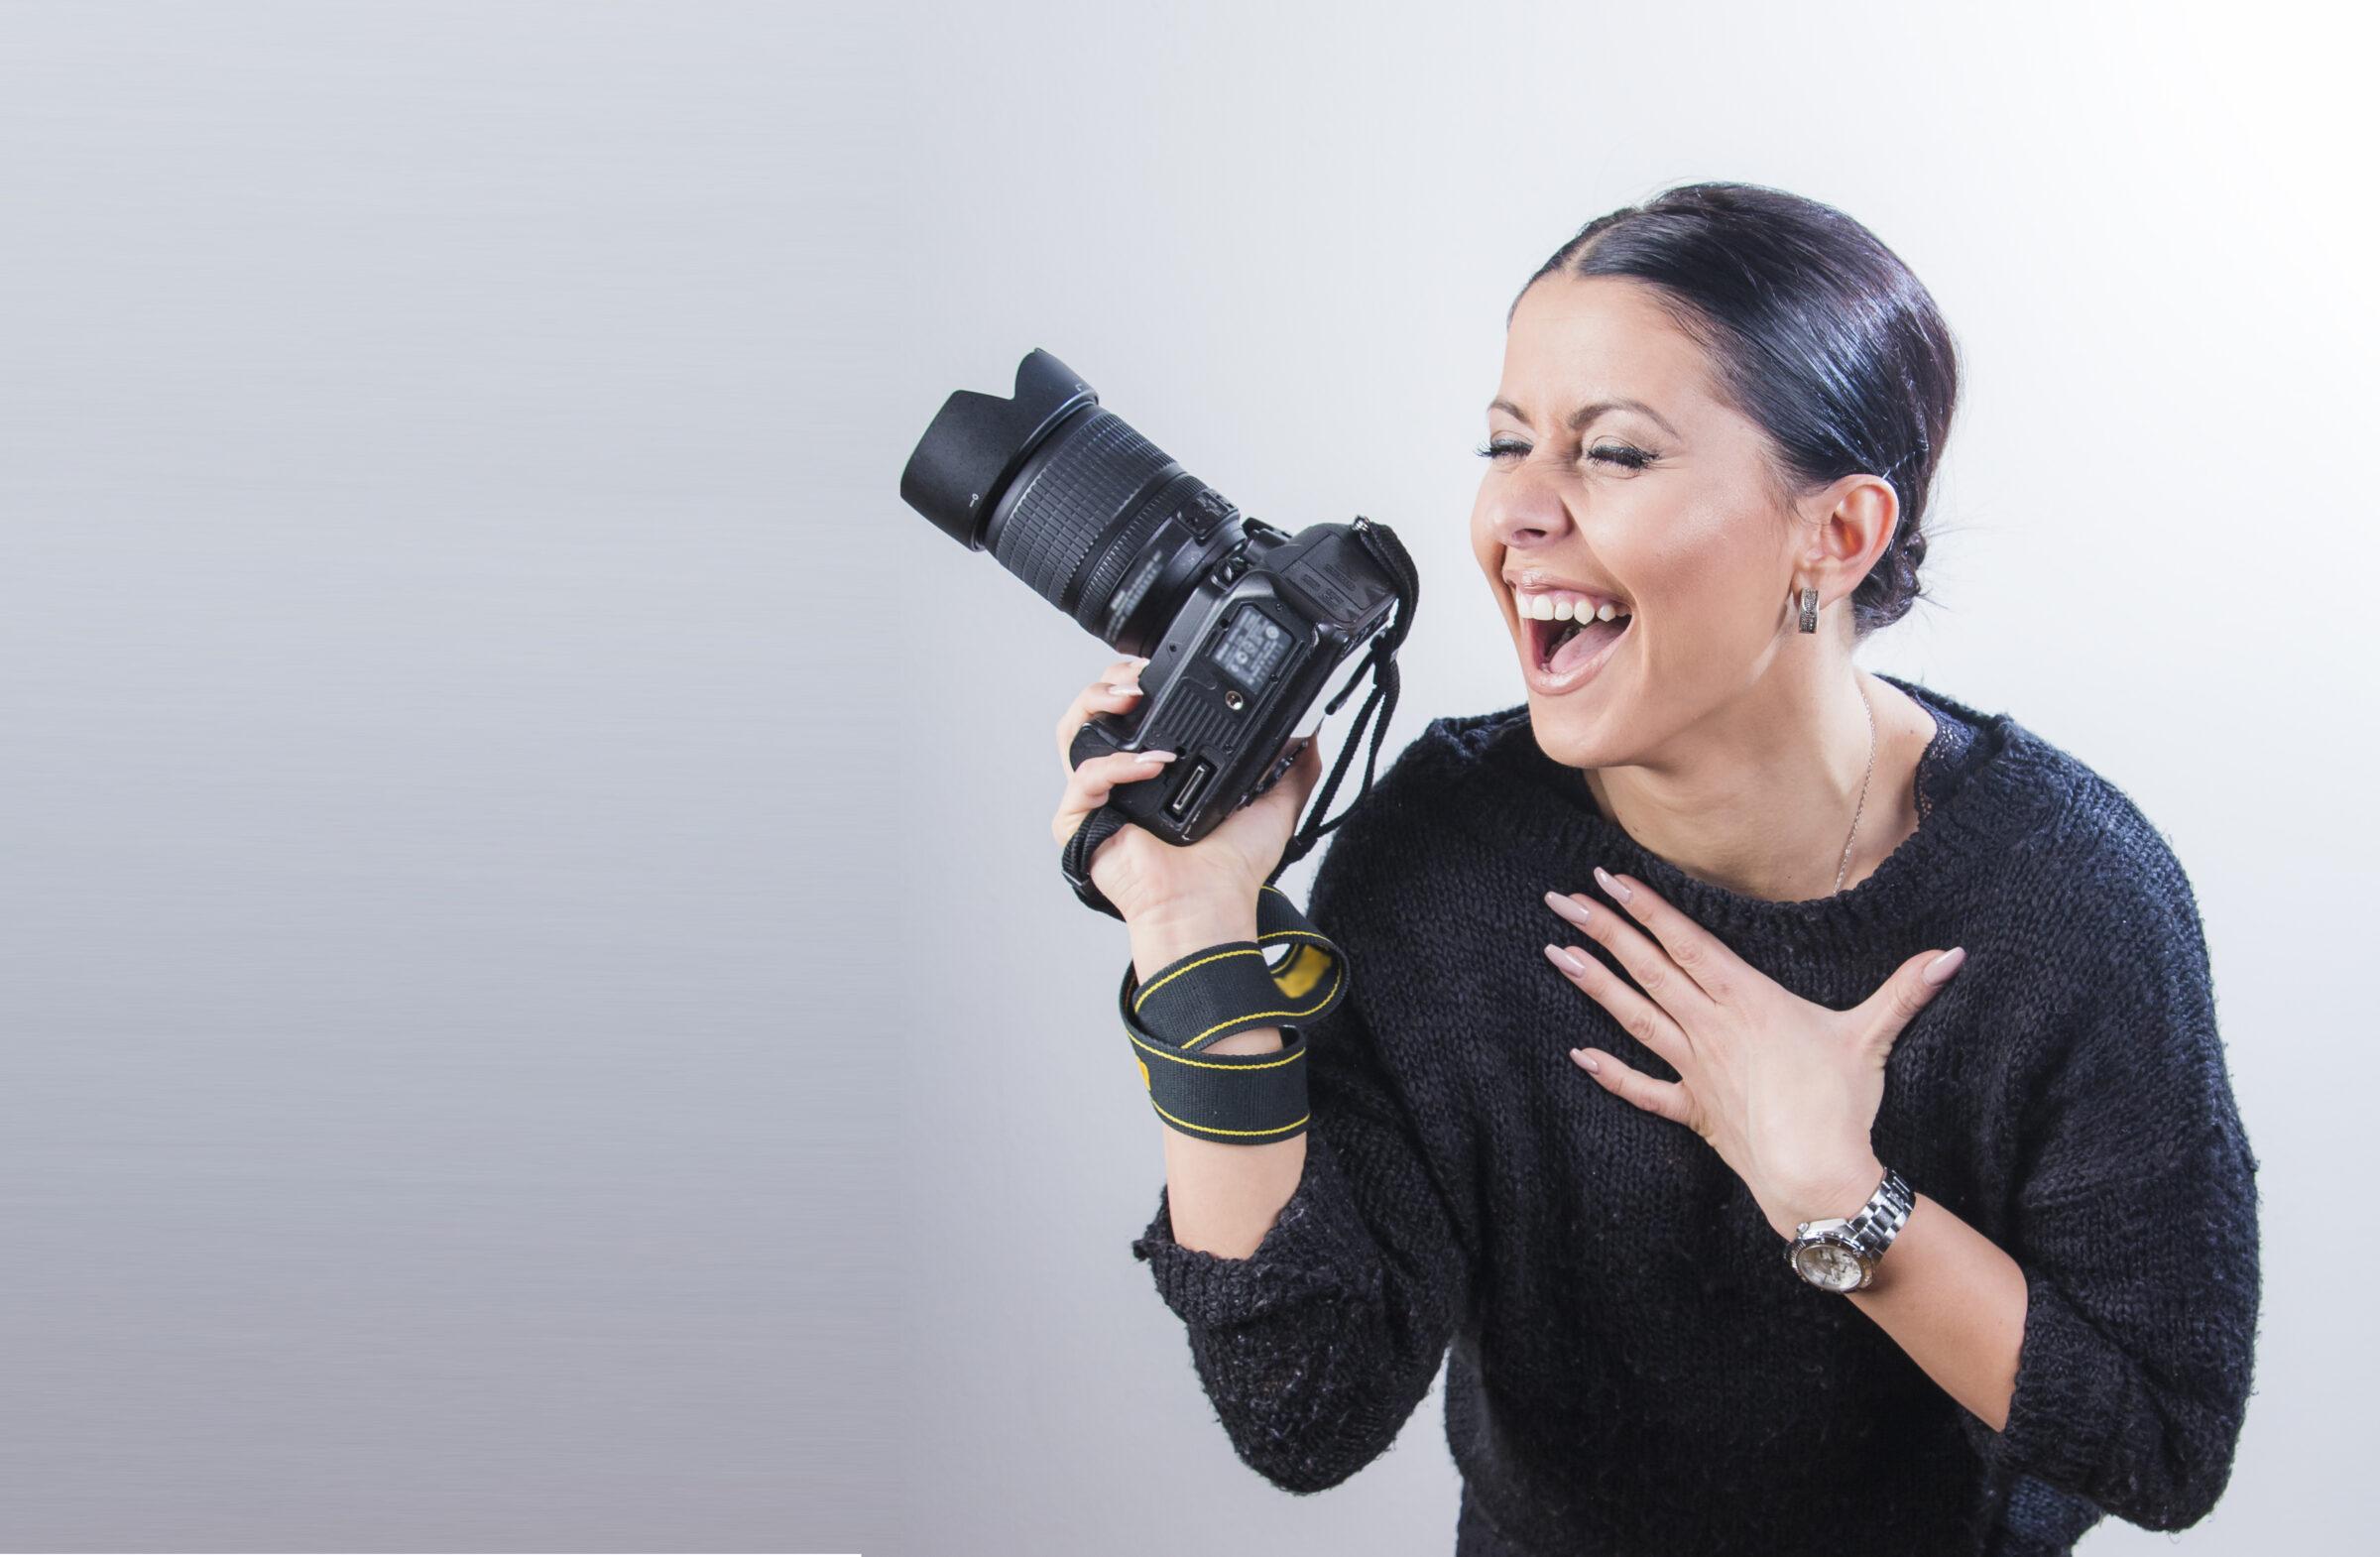 International Women's Day Photography female photo camera happy laughing